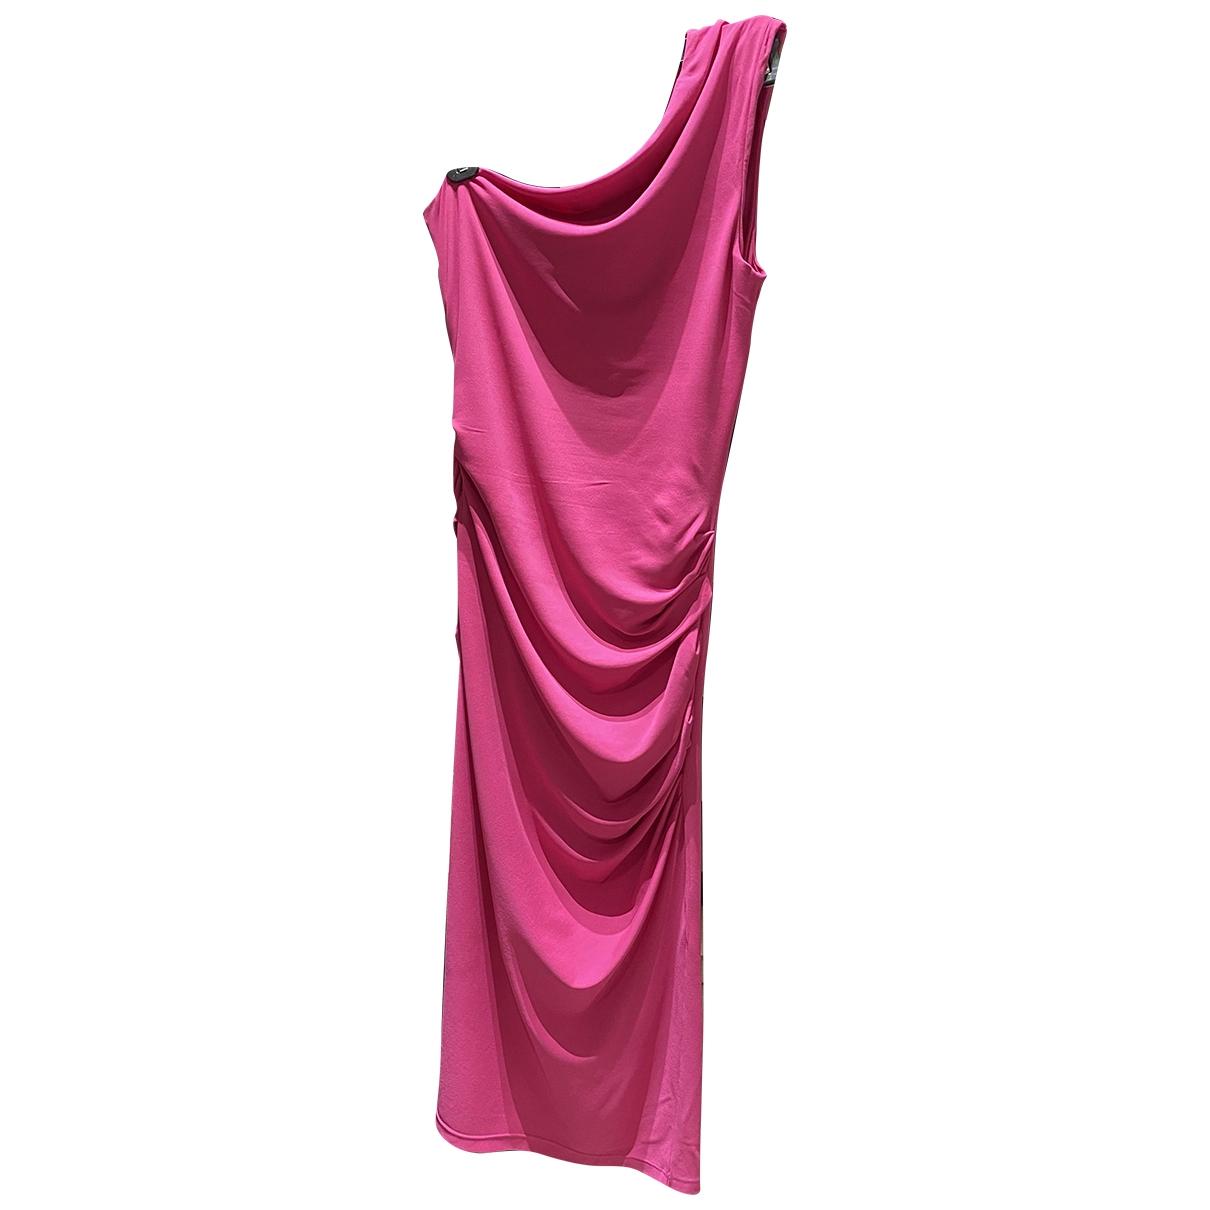 Michael Kors - Robe   pour femme en coton - elasthane - rose